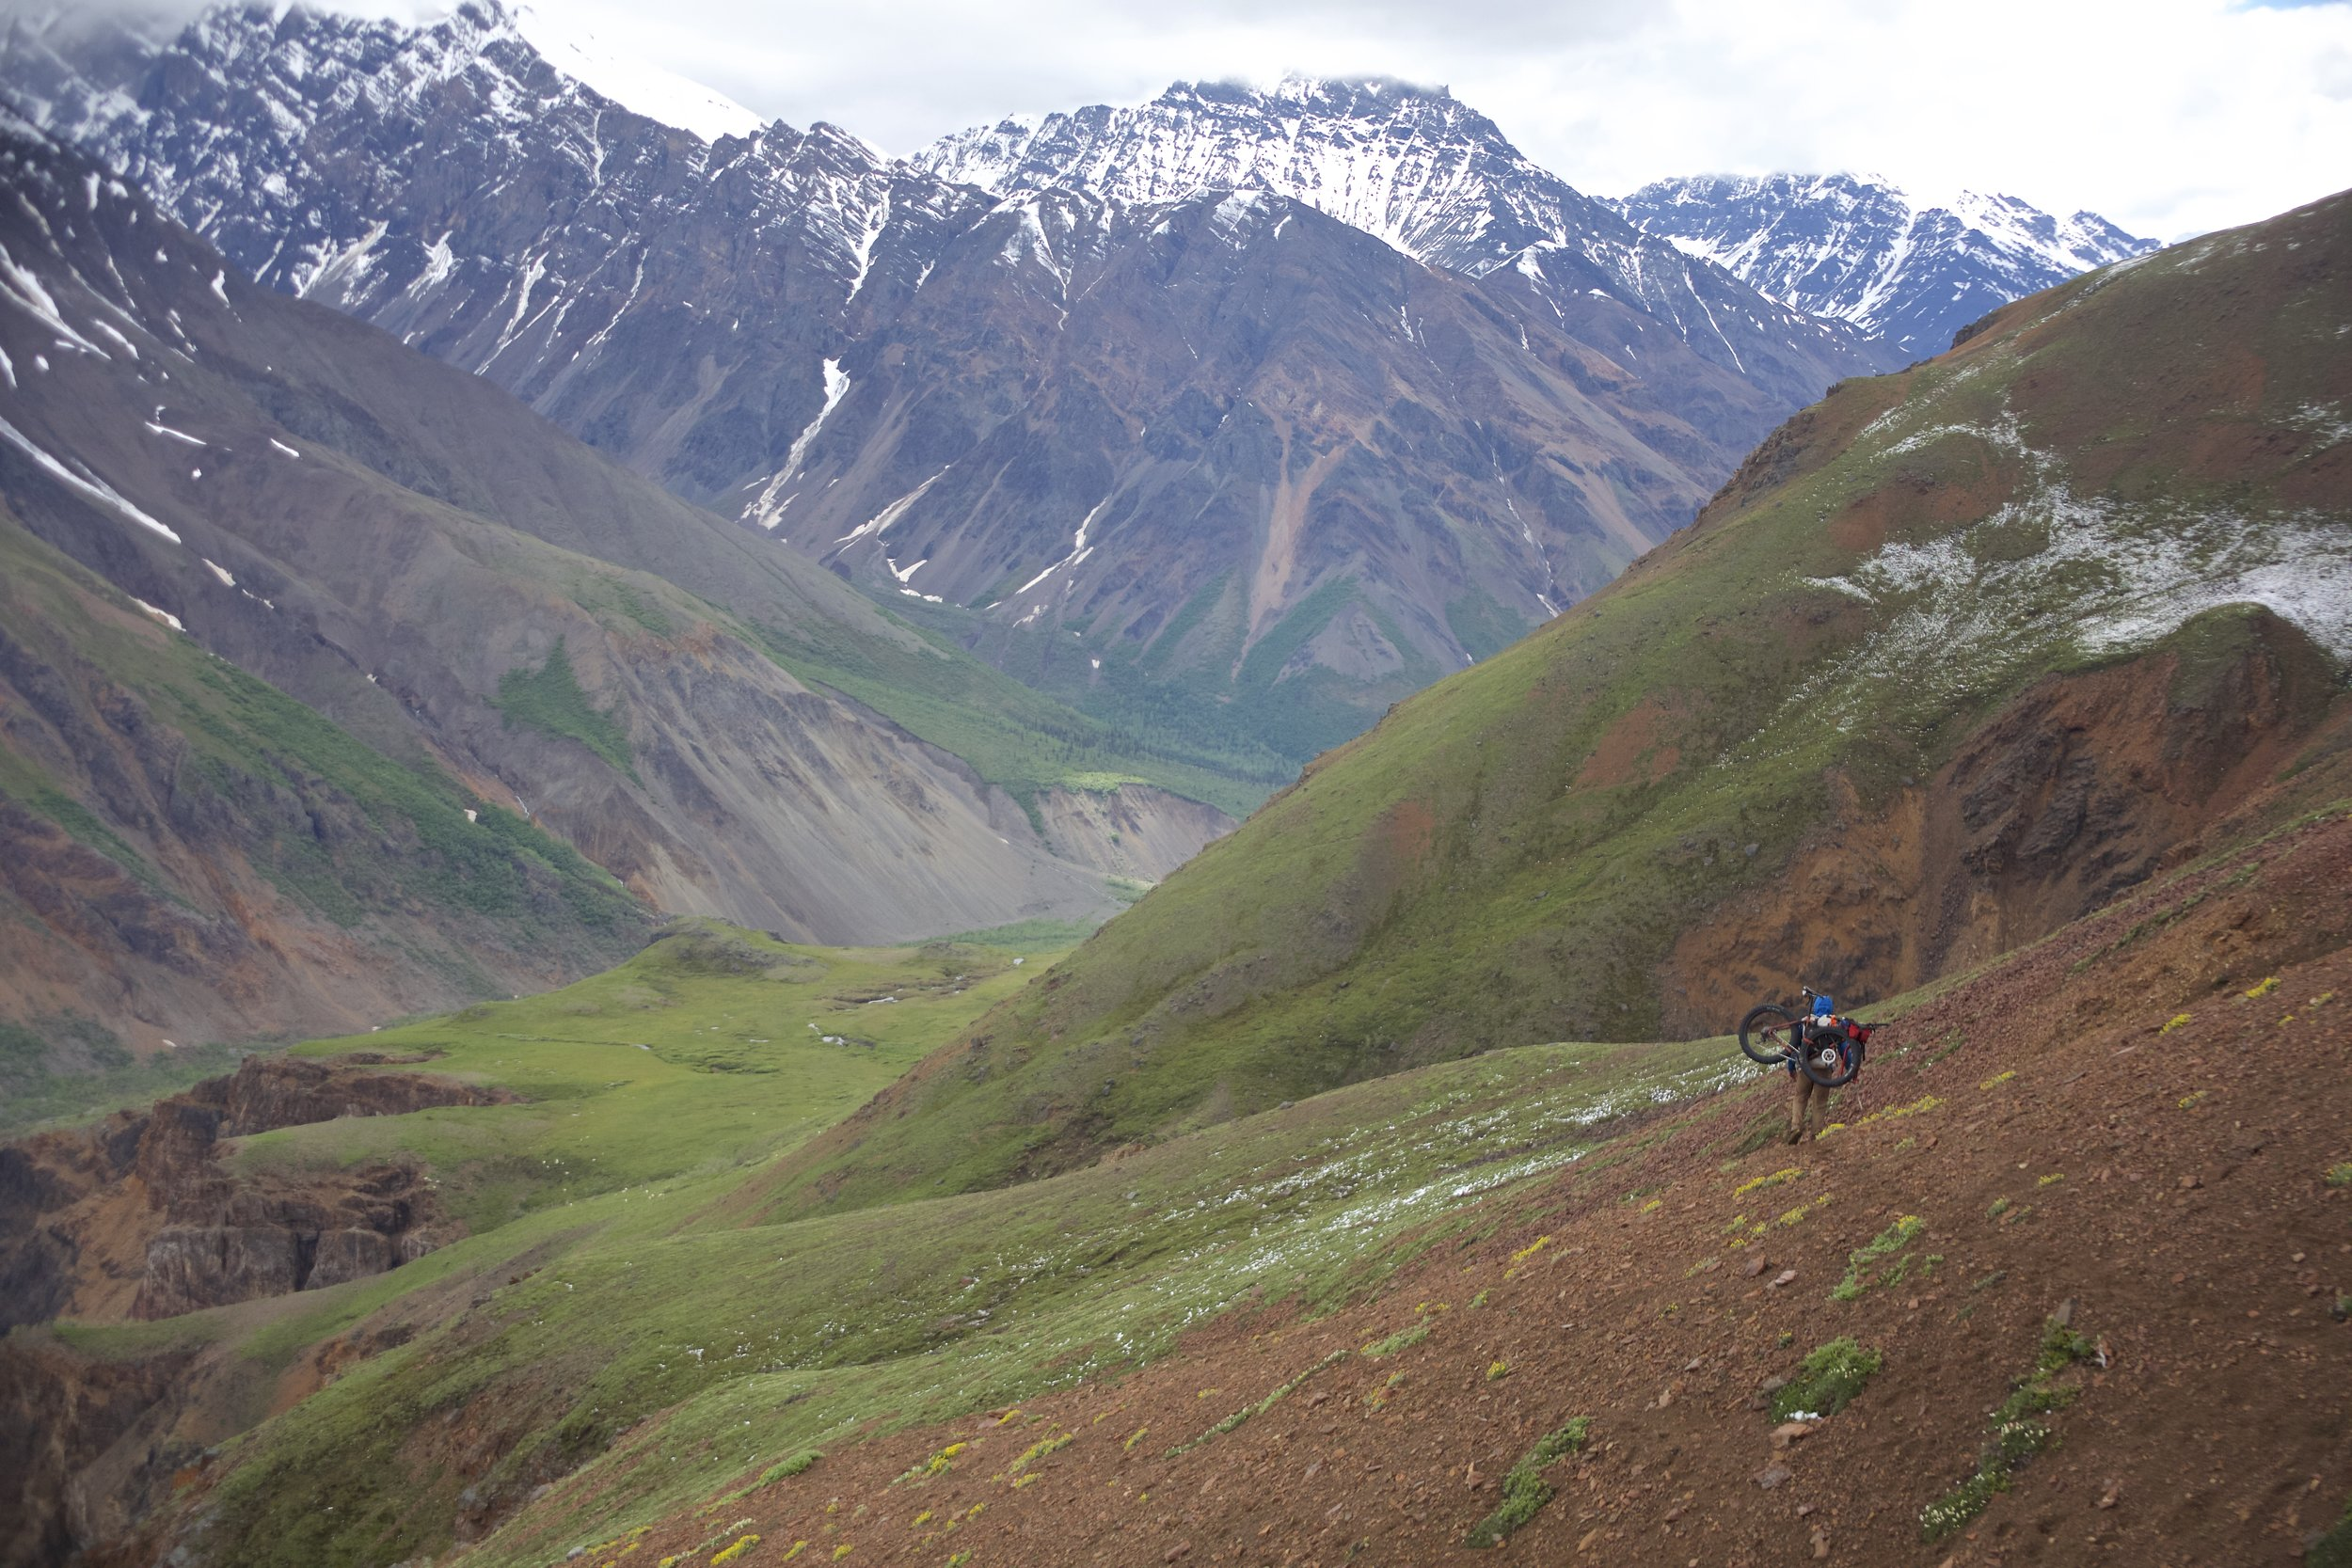 Brett makes his way along the goat trails. Photo: Mike Curiak.